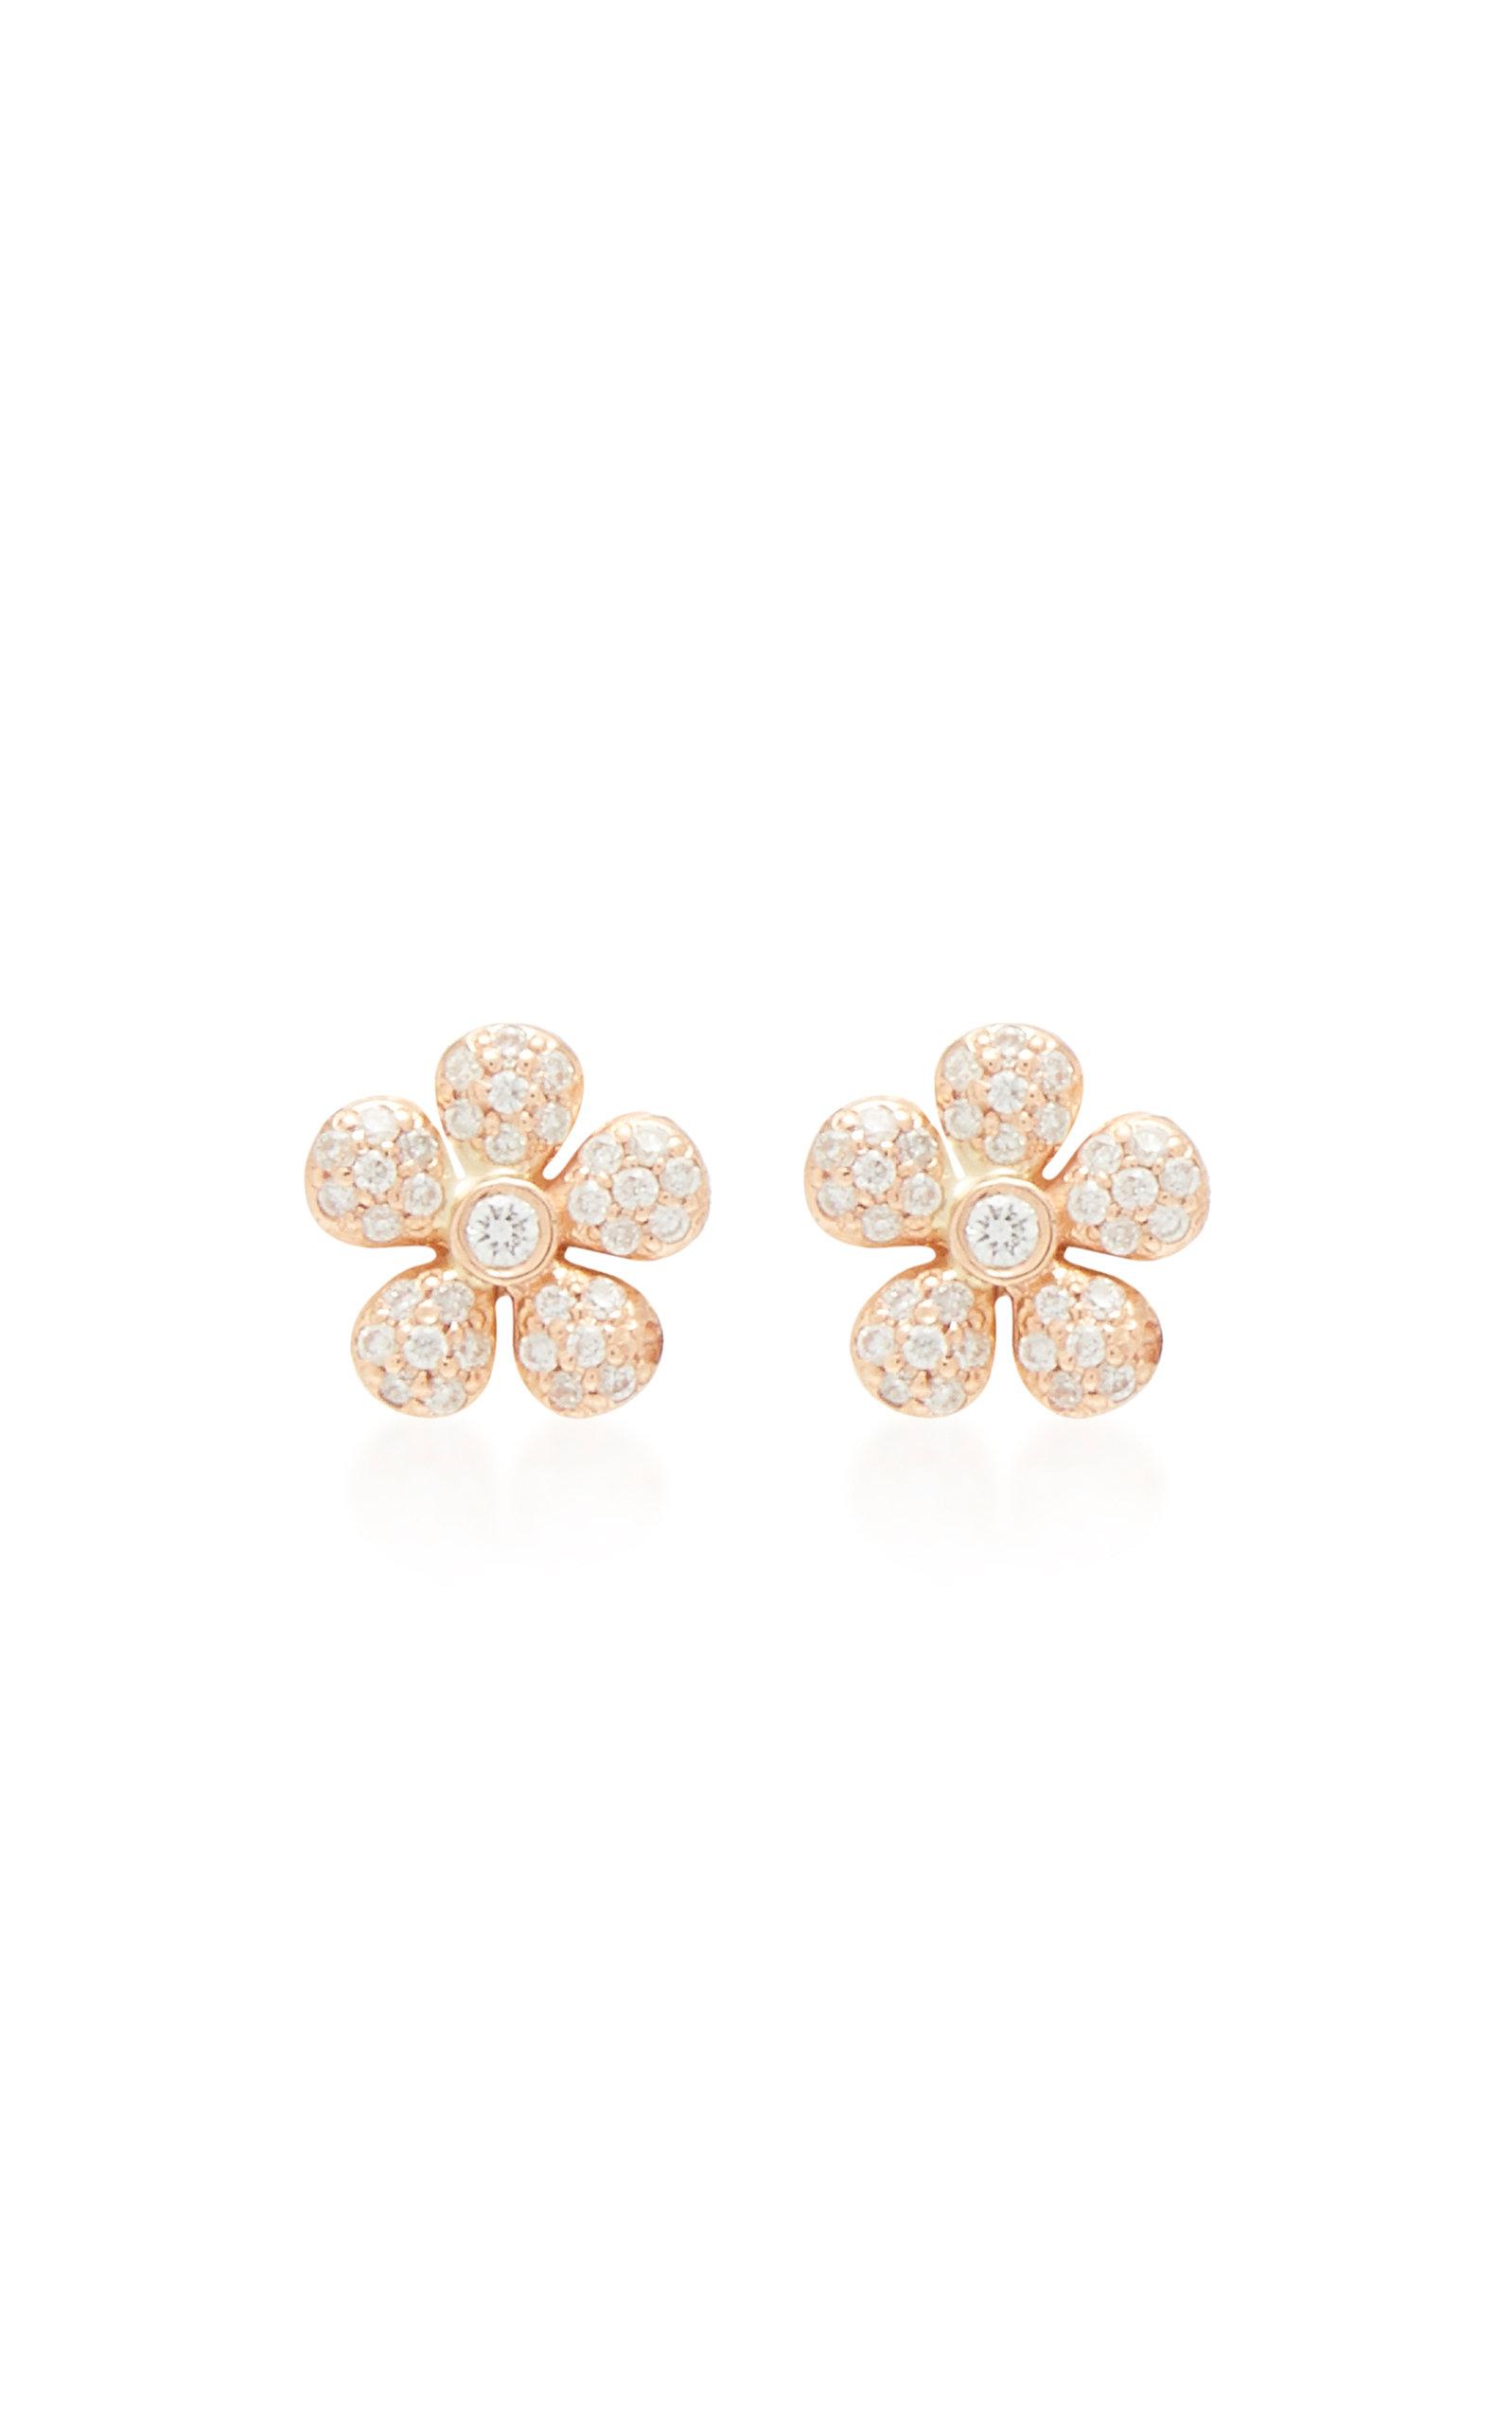 Women's 18K Gold and Diamond Earrings